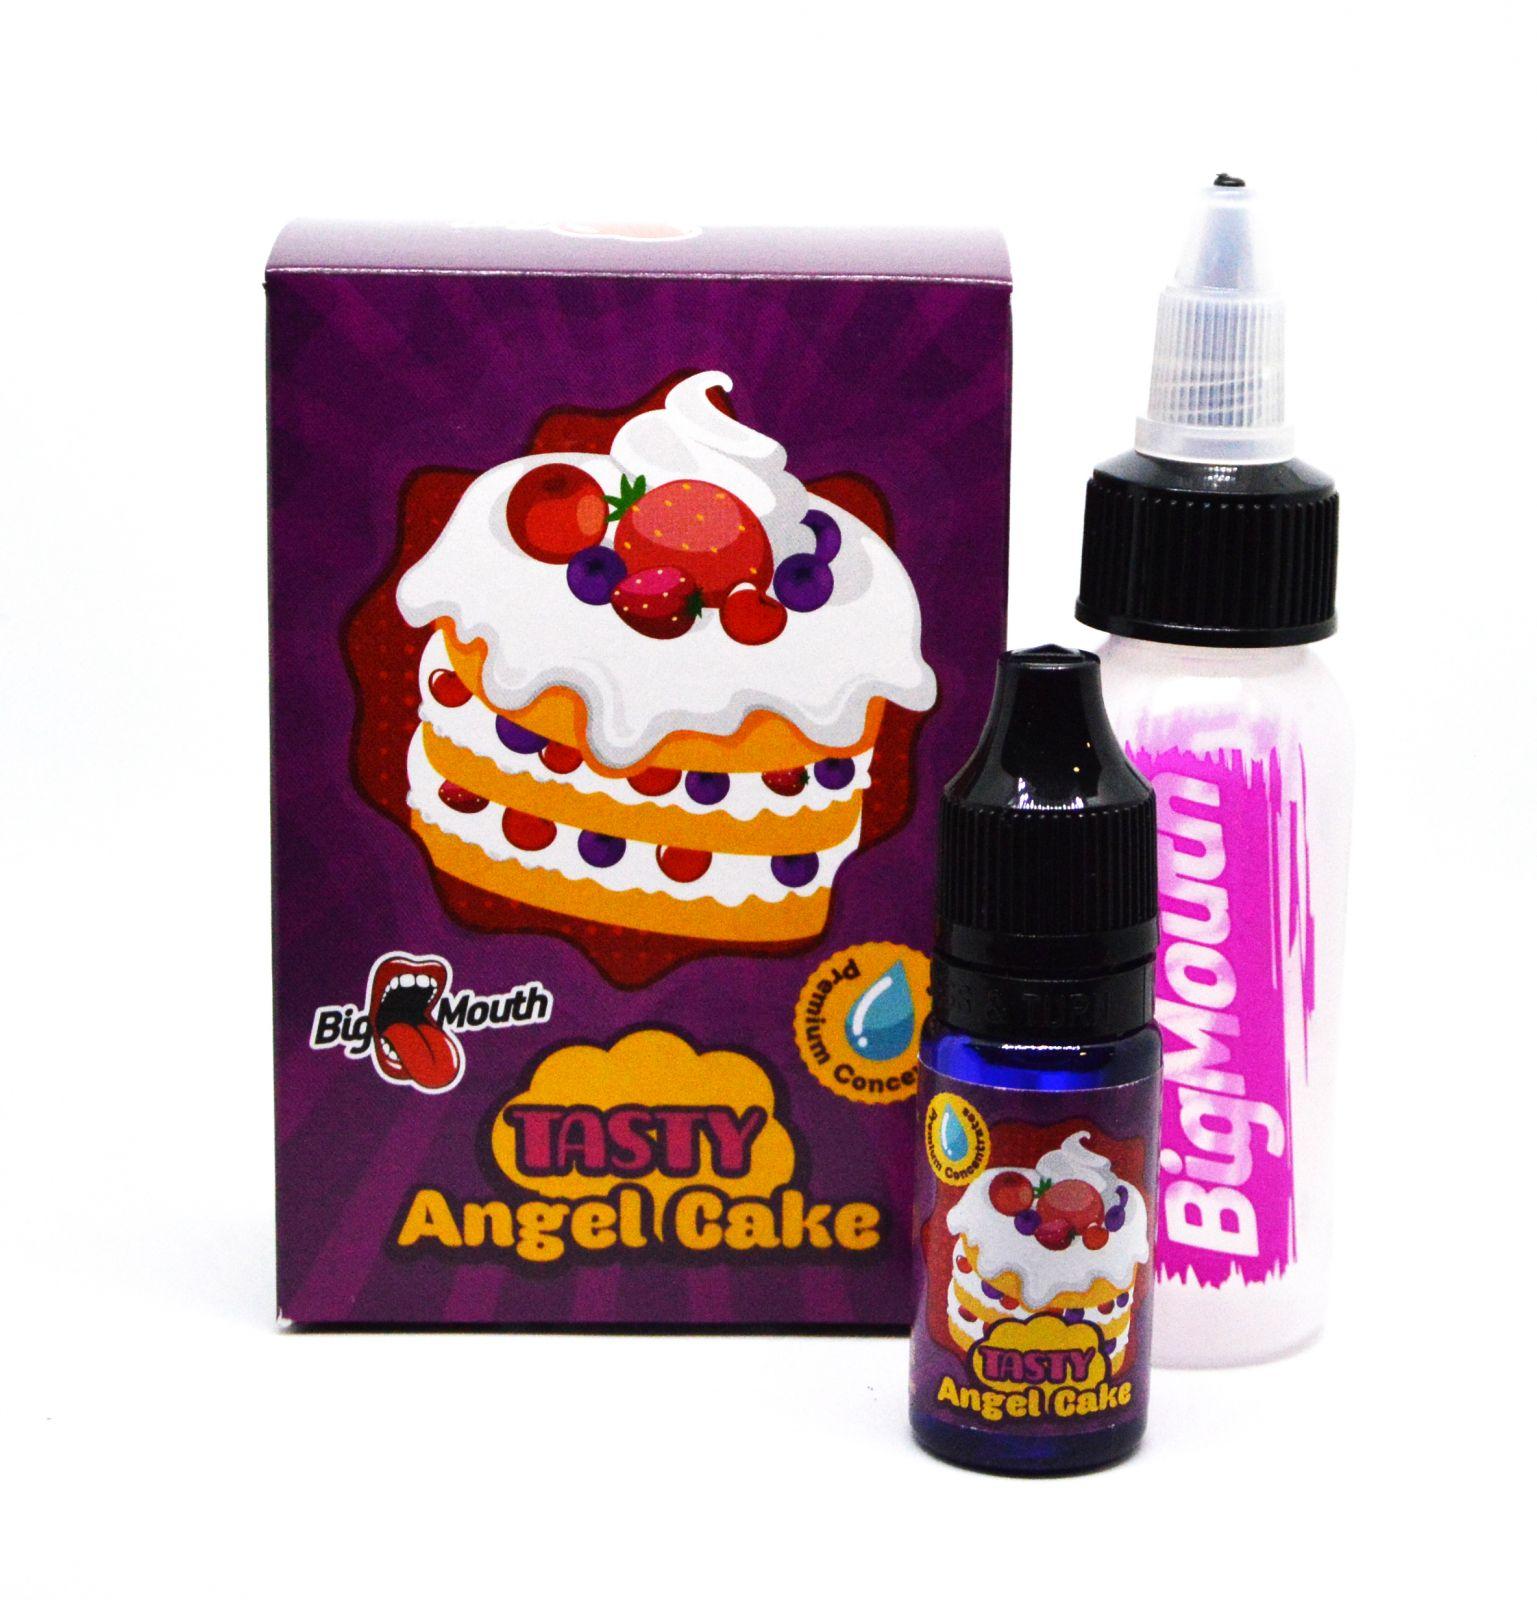 KRÉMOVÁ TORTA (Angel Cake) - aróma Big Mouth TASTY